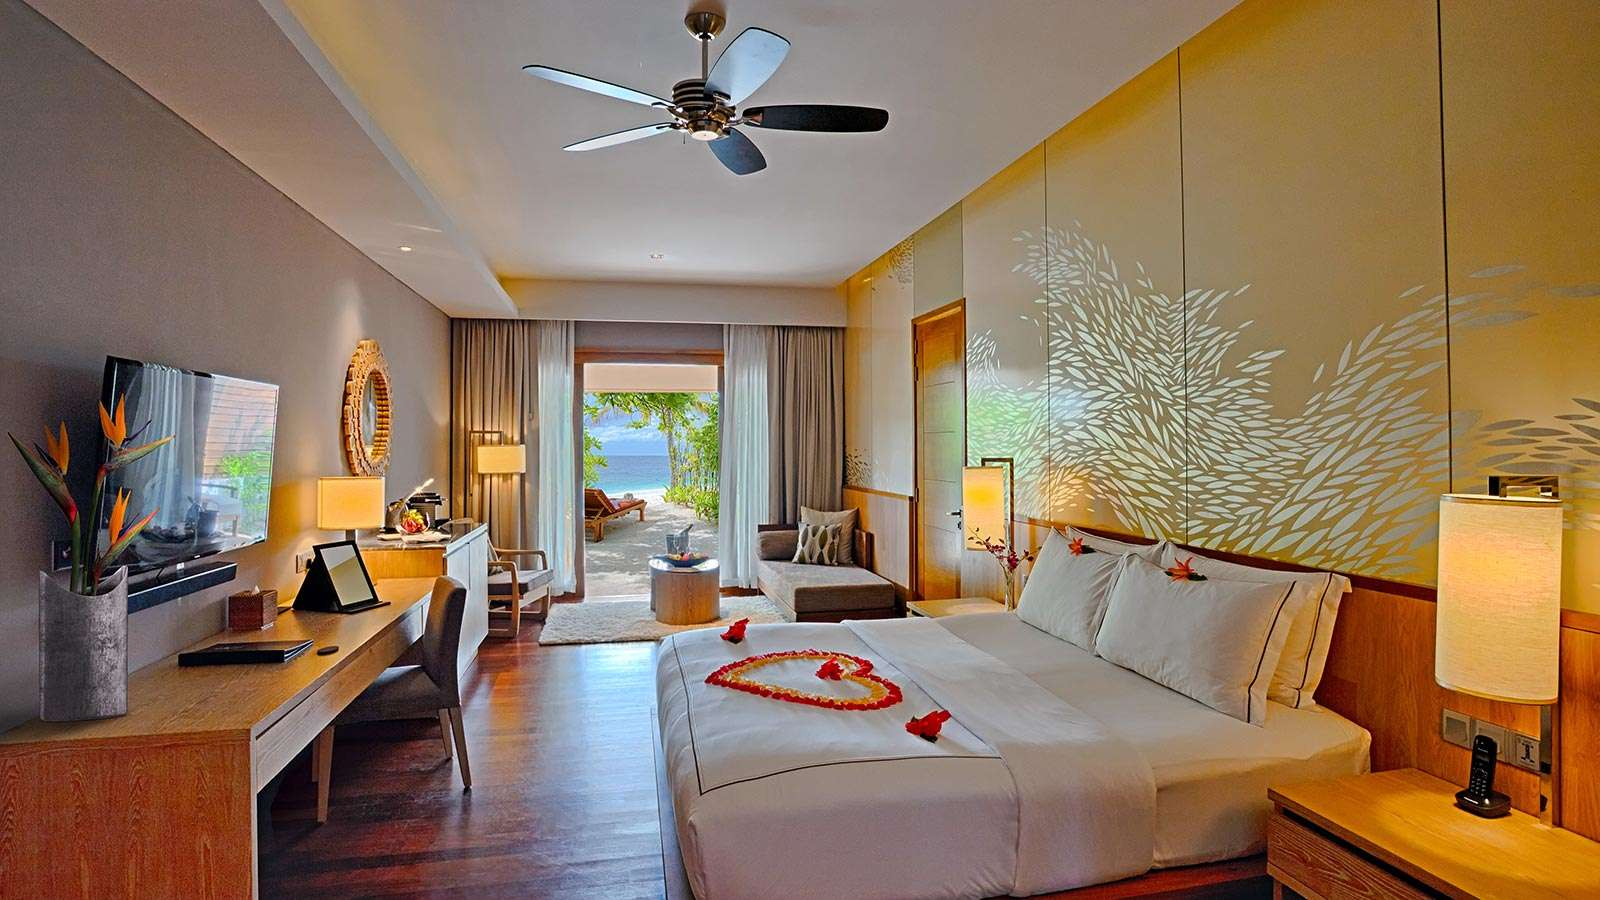 Luxury villa rentals asia - Maldives - Huvahandhoo - Lily beachresortandspa - Beach Suite with Pool - Image 1/5